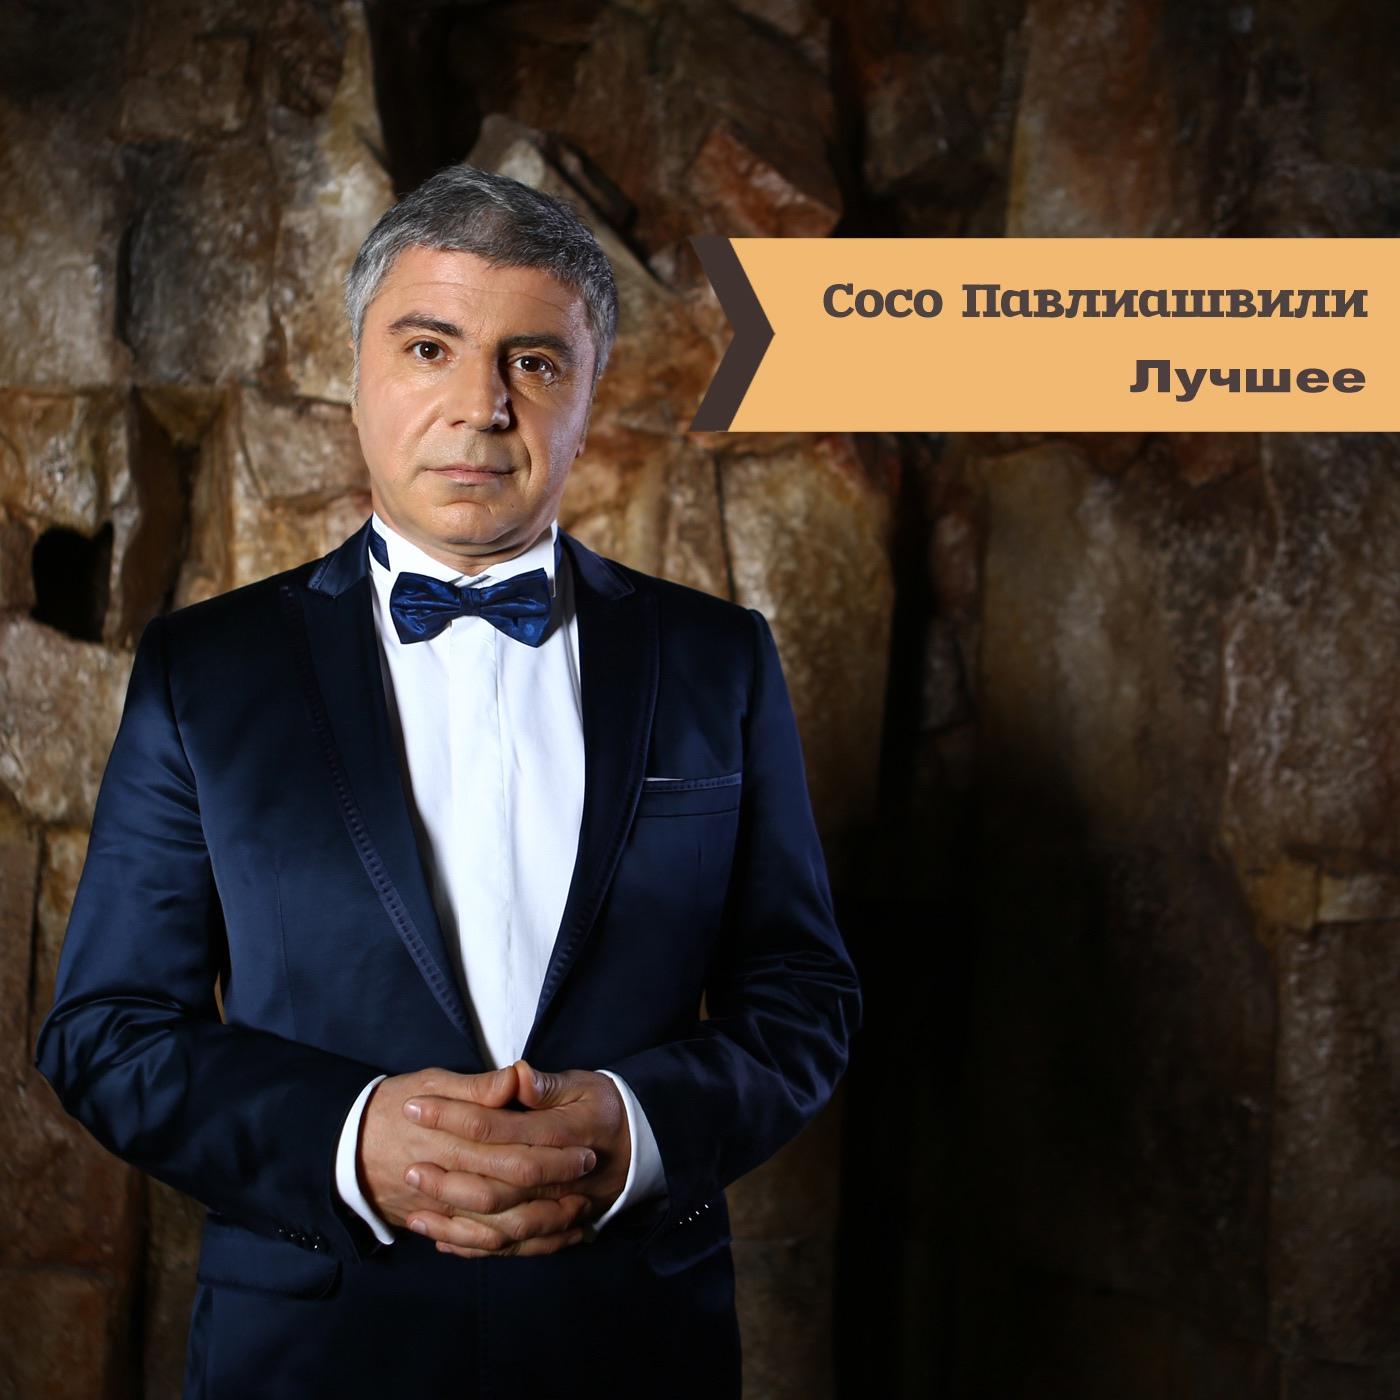 Сосо Павлиашвили